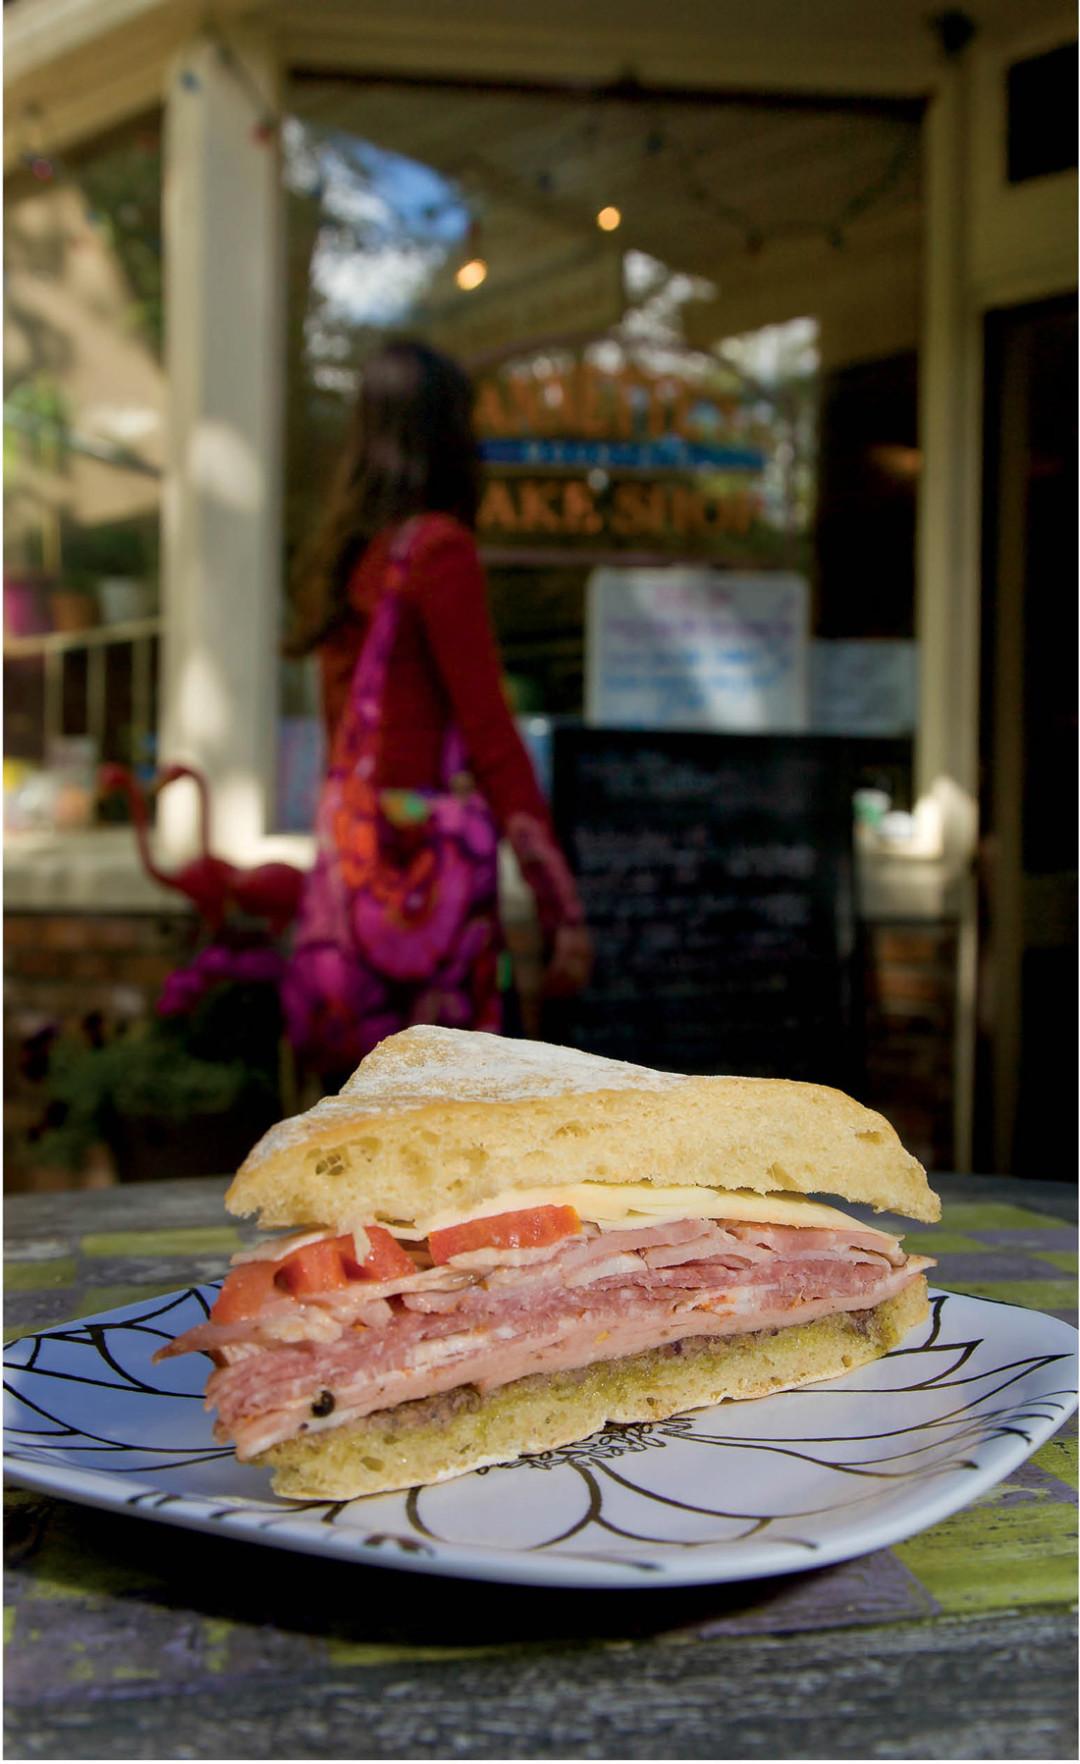 1115 dish story annettes sandwich upu1hq